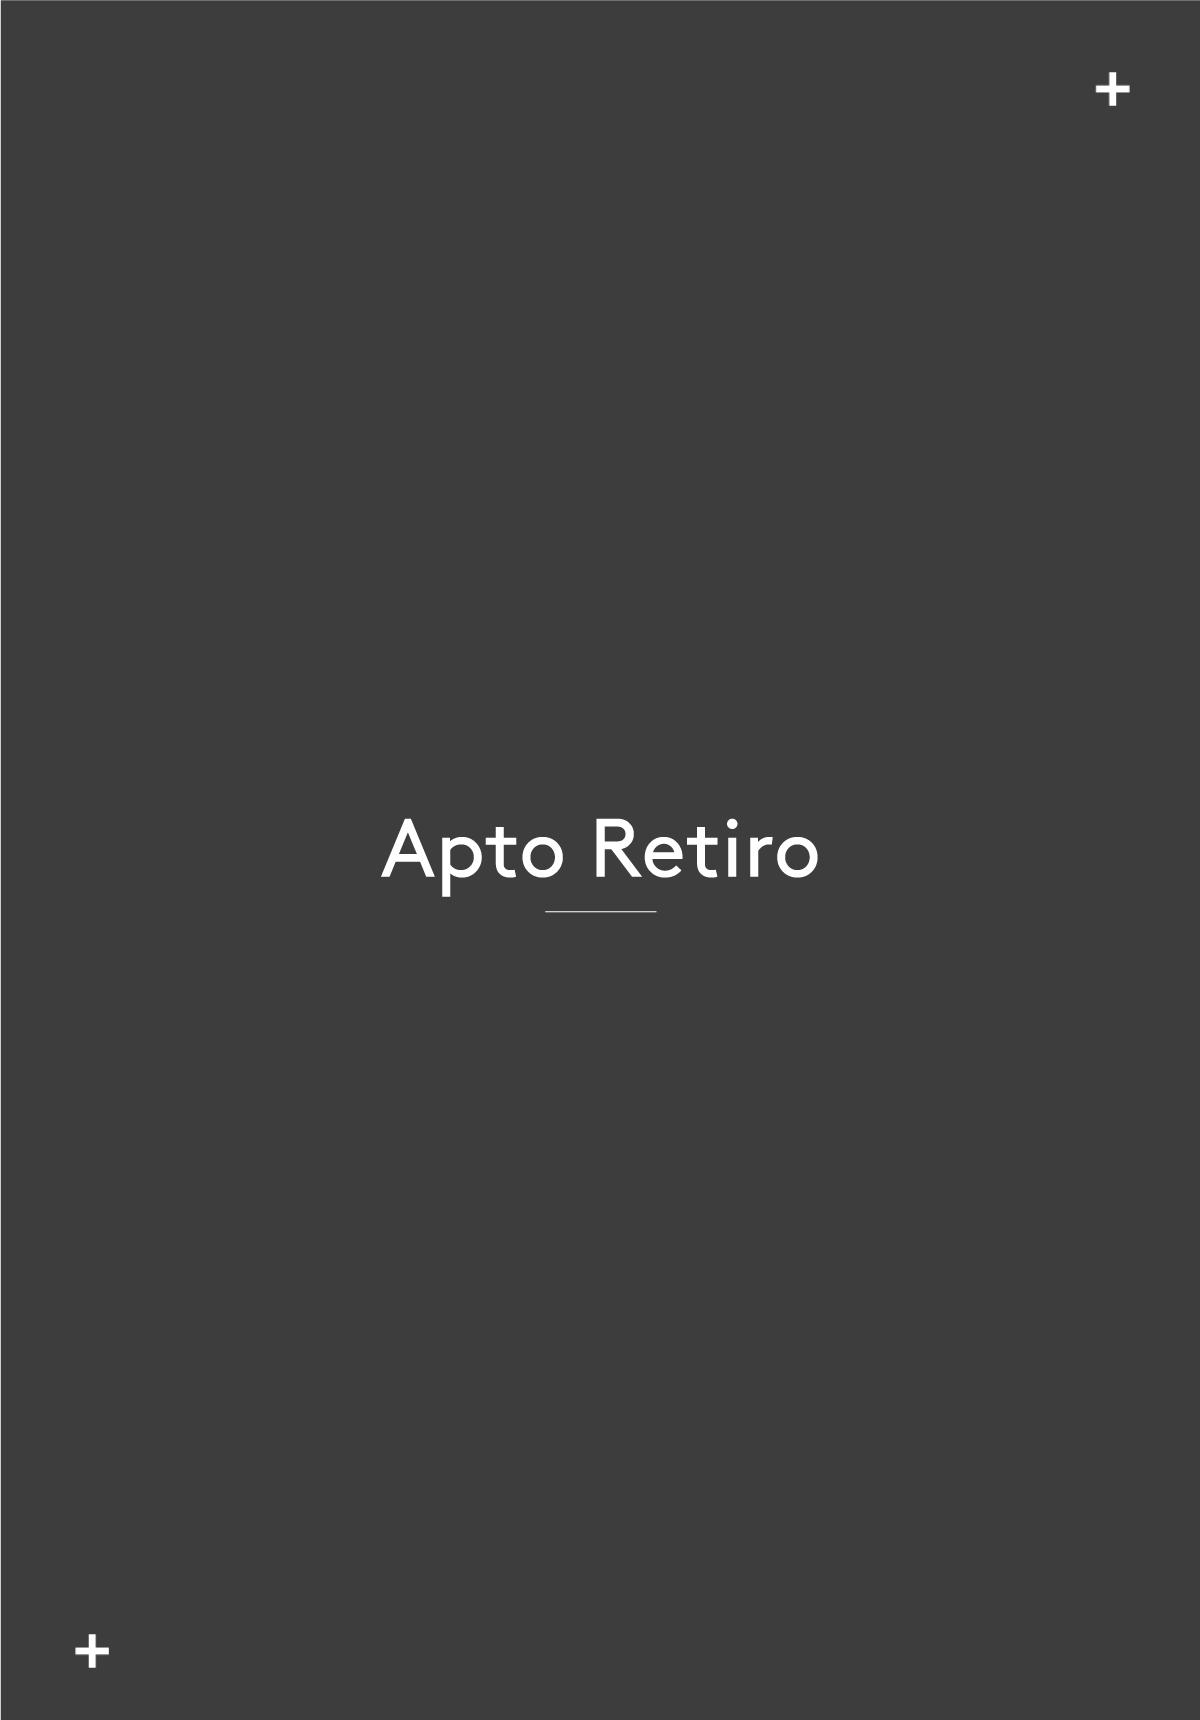 Apto-Retiro